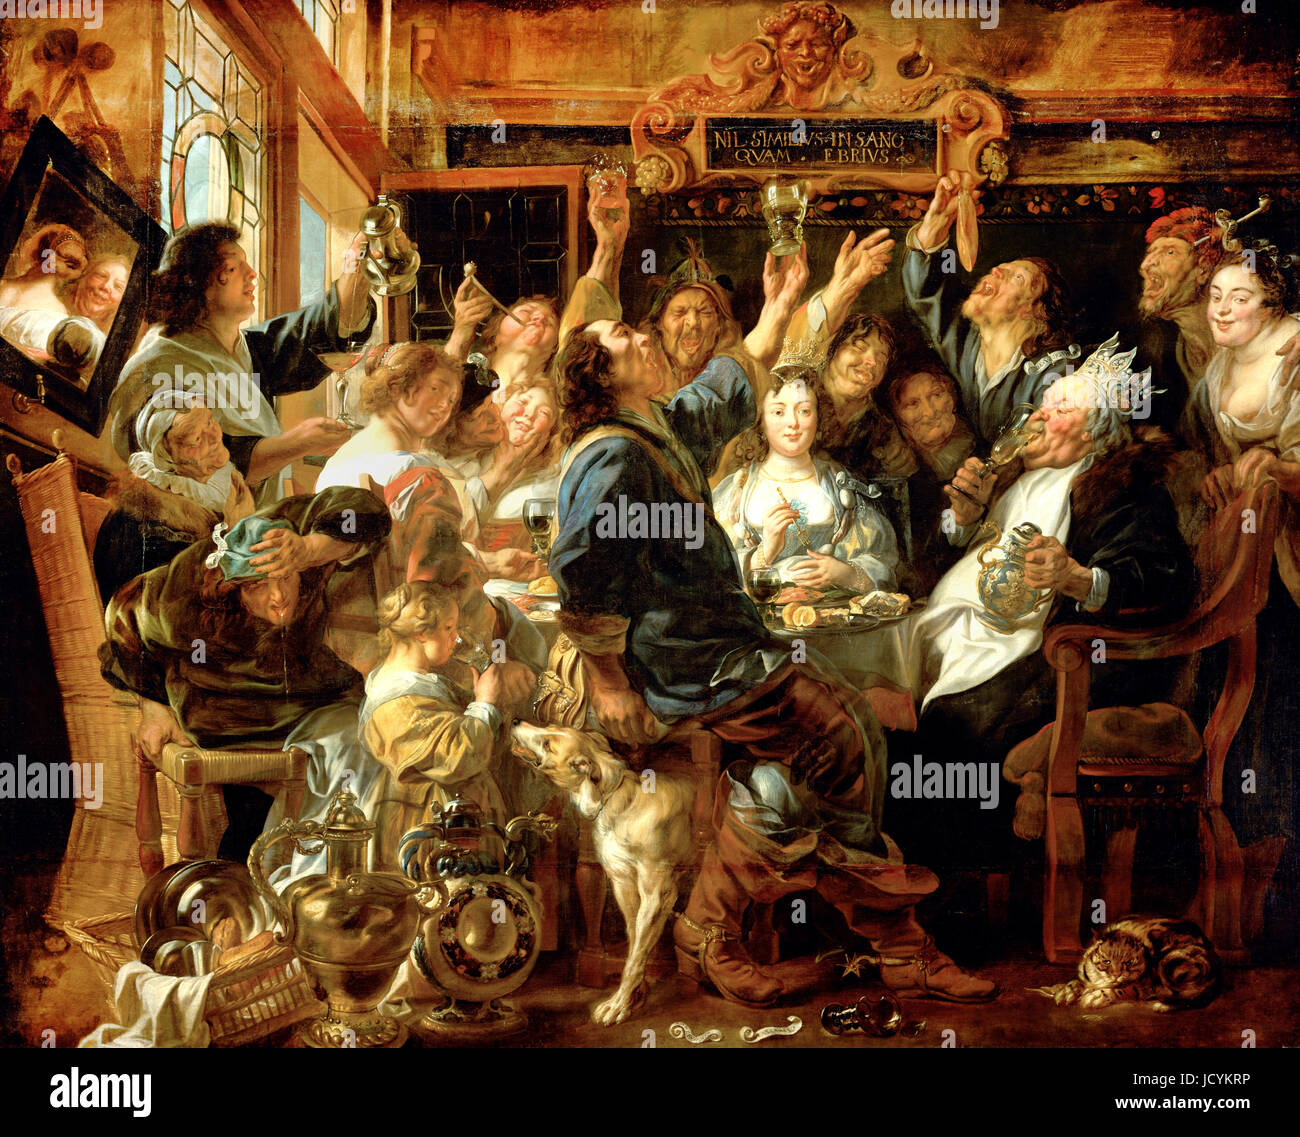 Jacob Jordaens, The Feast Bean König 1640-1645 Öl auf Leinwand. Kunsthistorisches Museum, Wien, Österreich. Stockbild